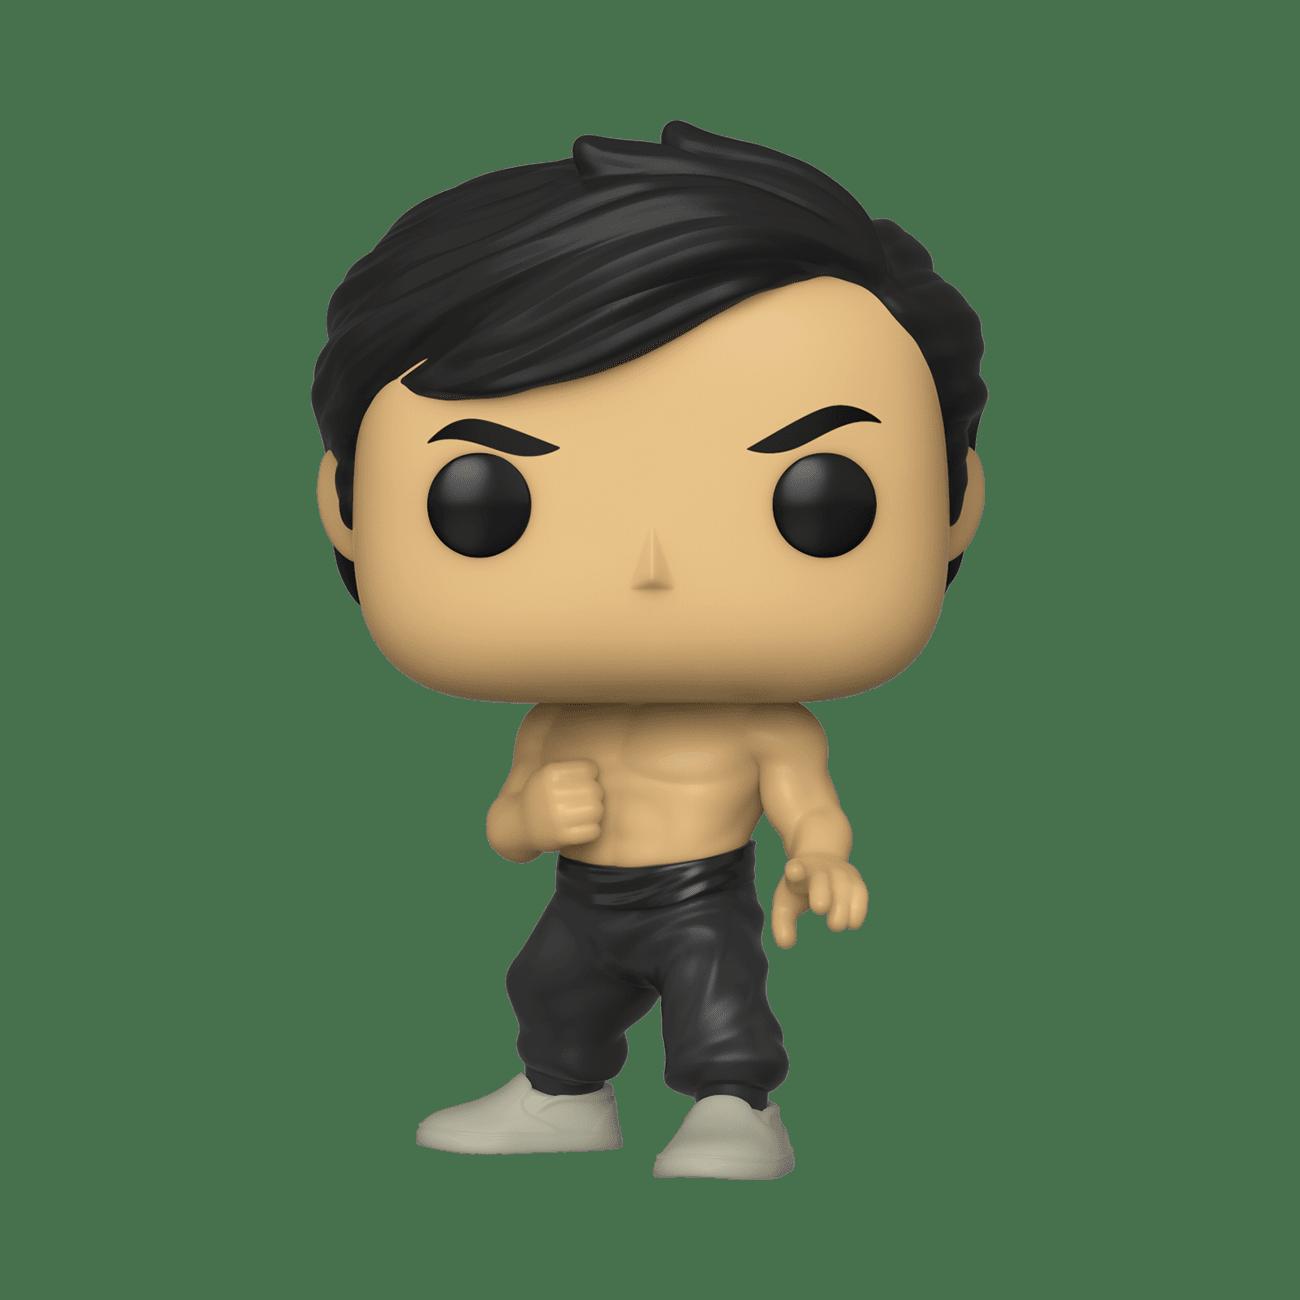 Mortal Kombat Liu Kang Pop! Vinyl Figure